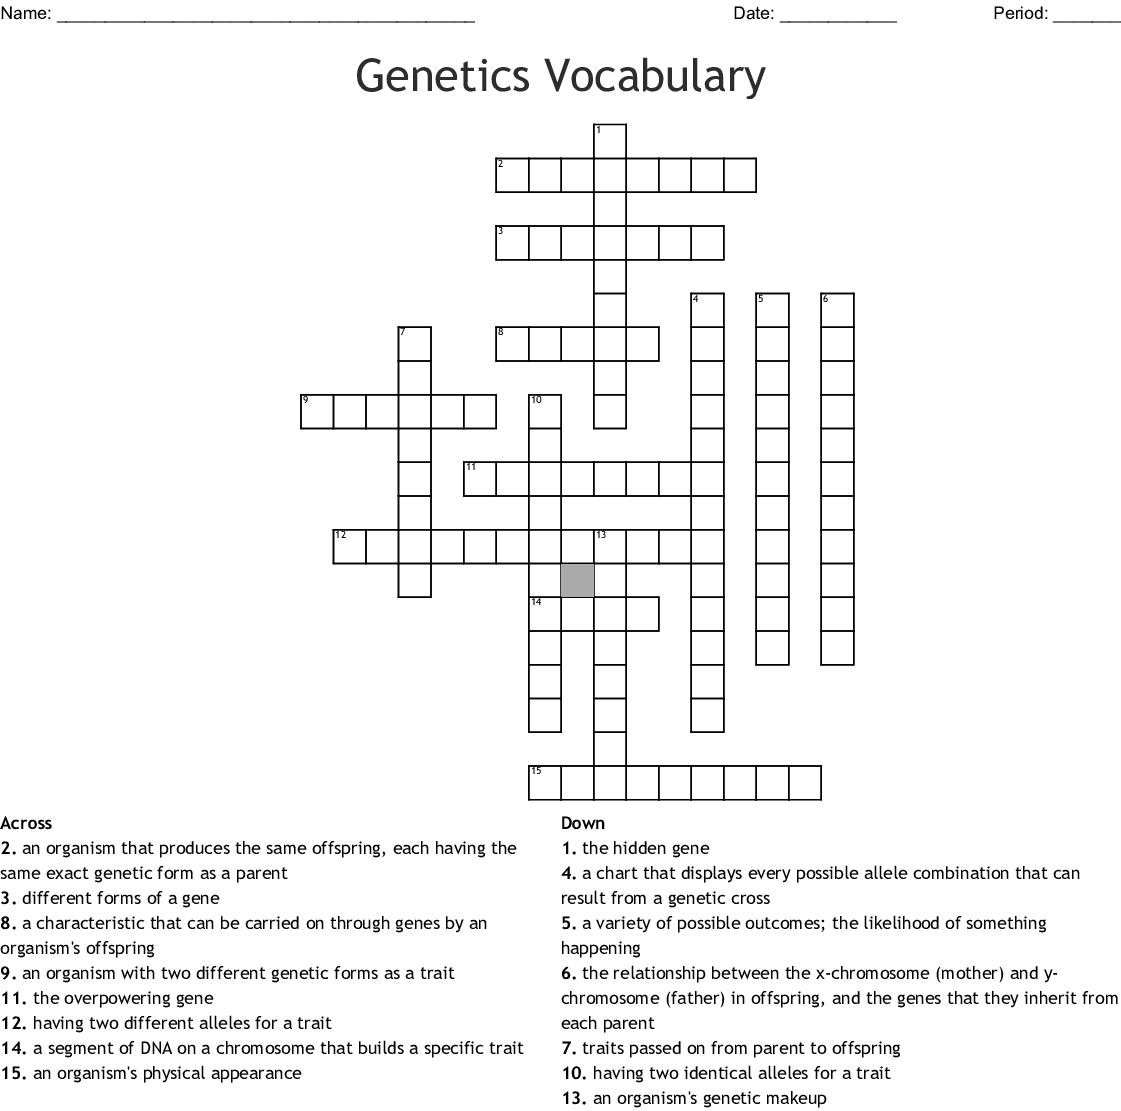 Genetics Vocabulary Worksheet Crossword Answer Key